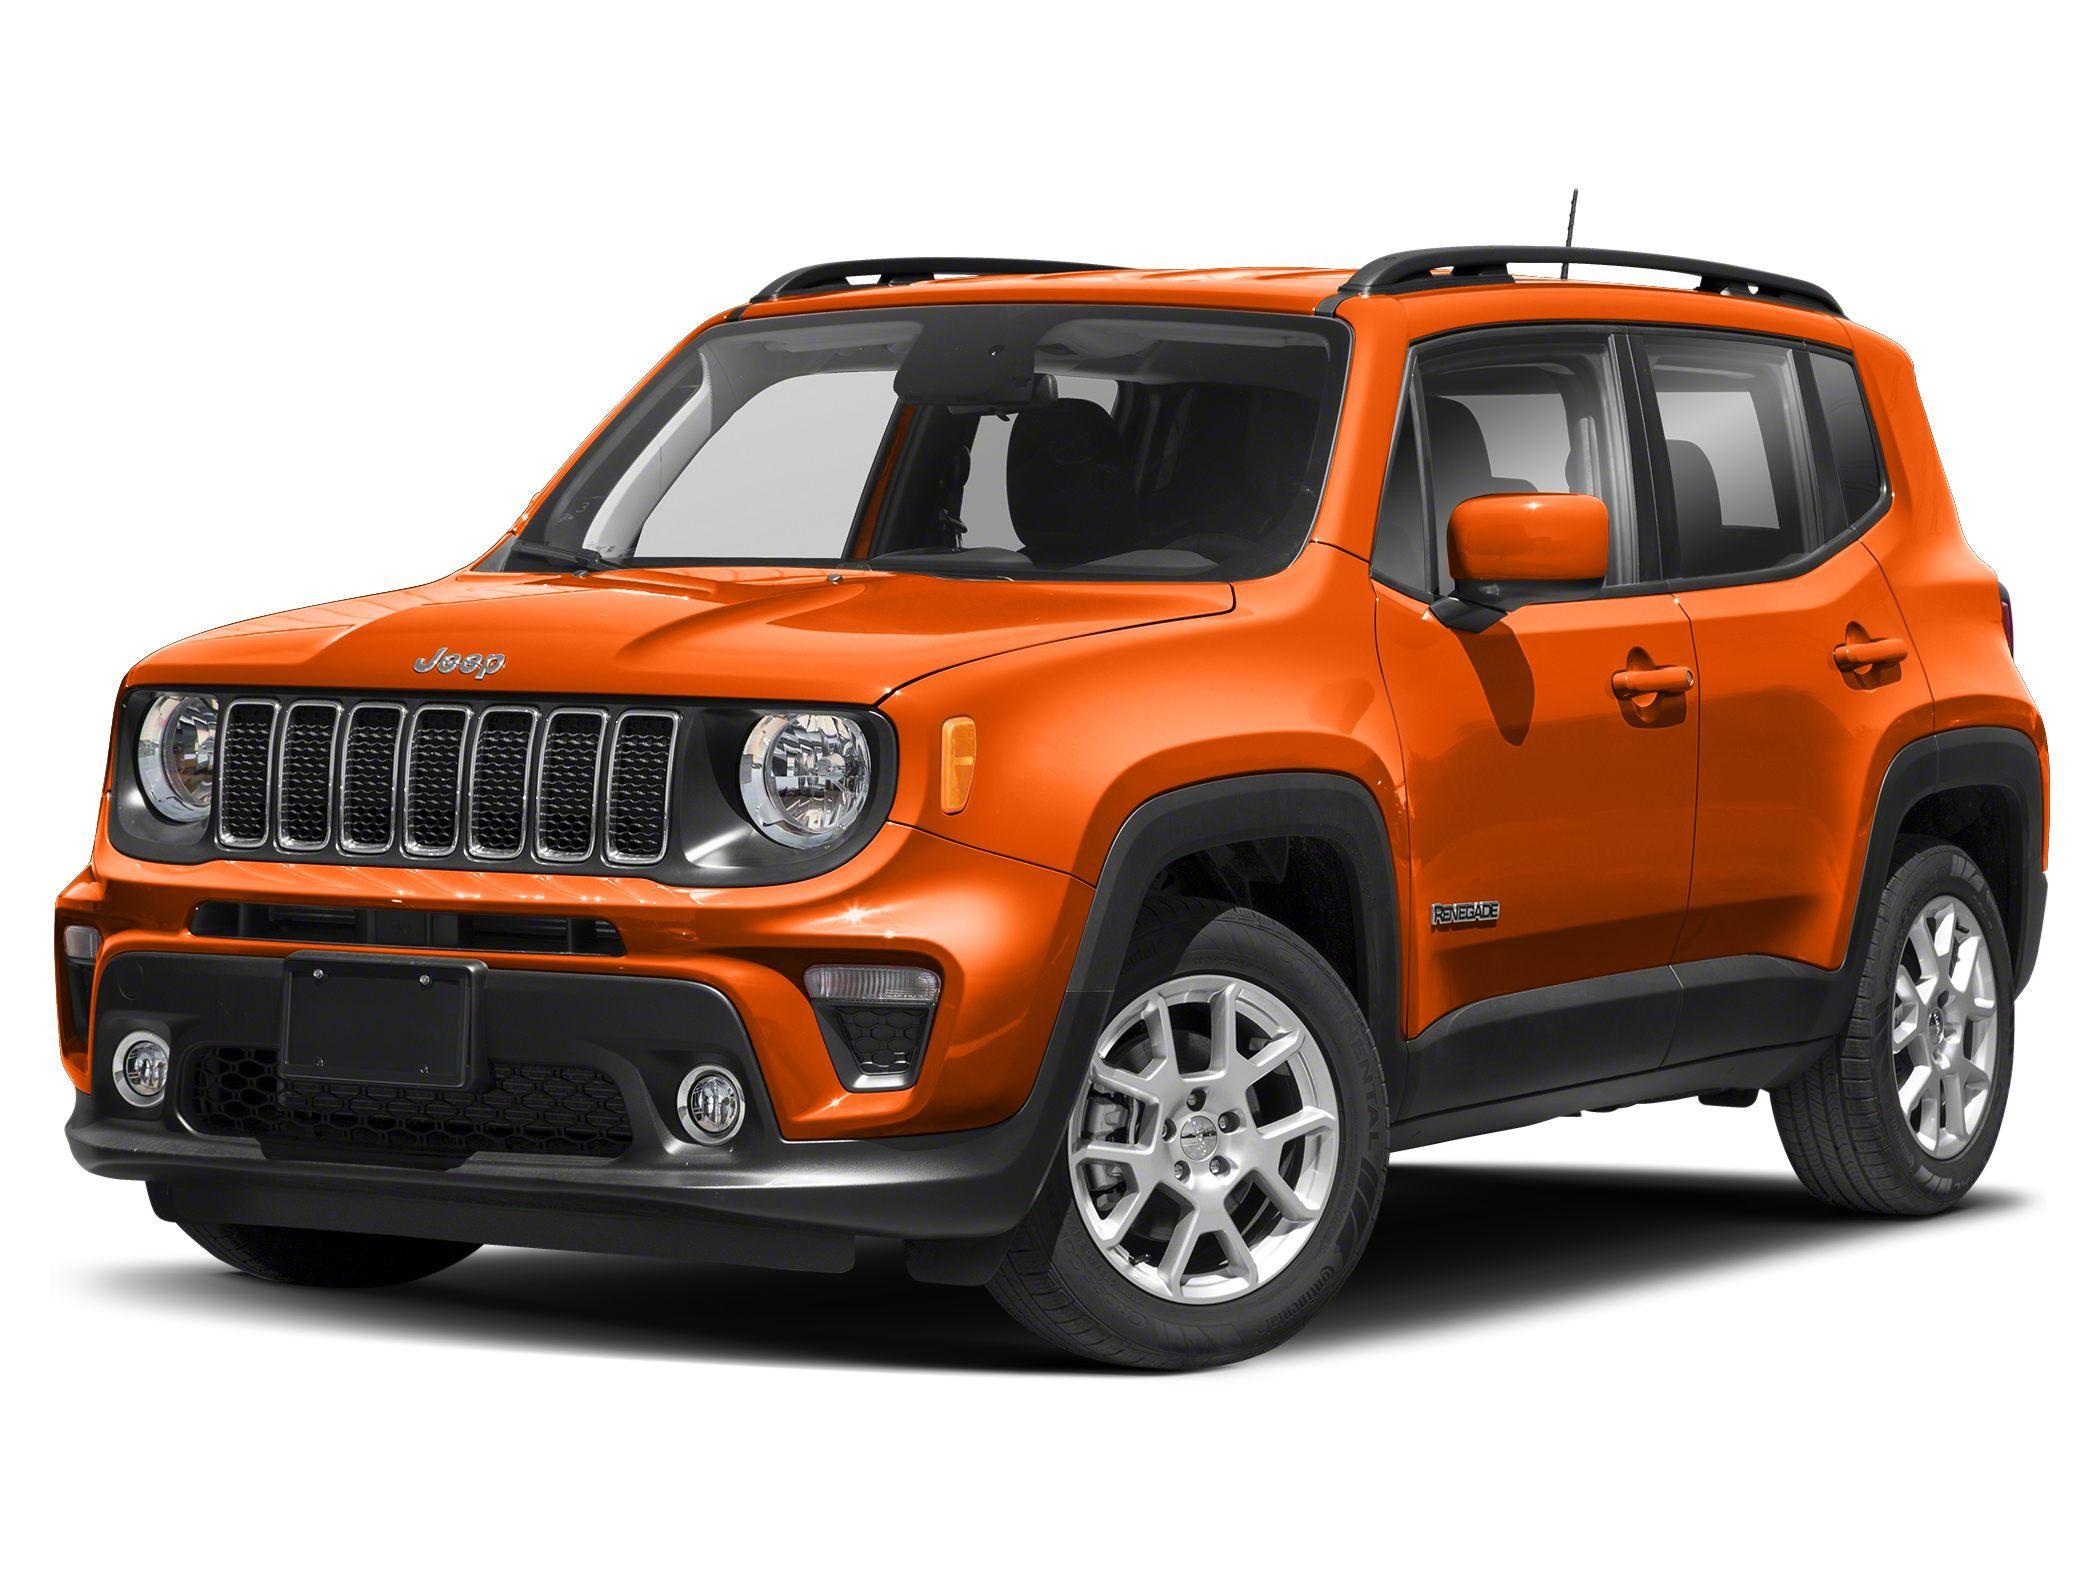 2020 Jeep Renegade SUV